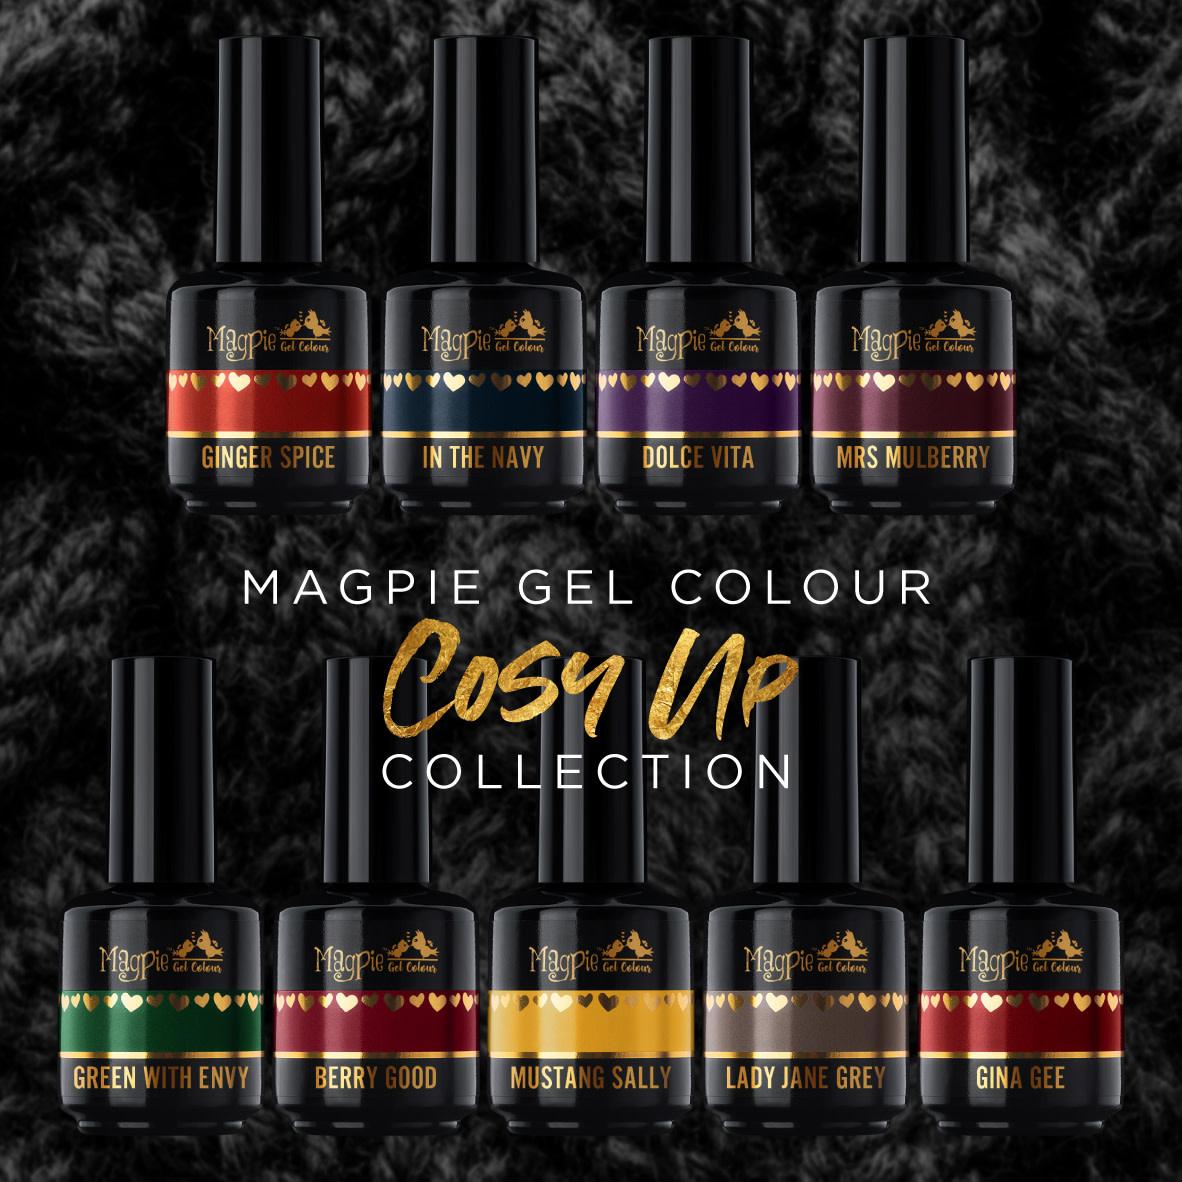 Magpie Lady Jane Grey 15ml MP uvled